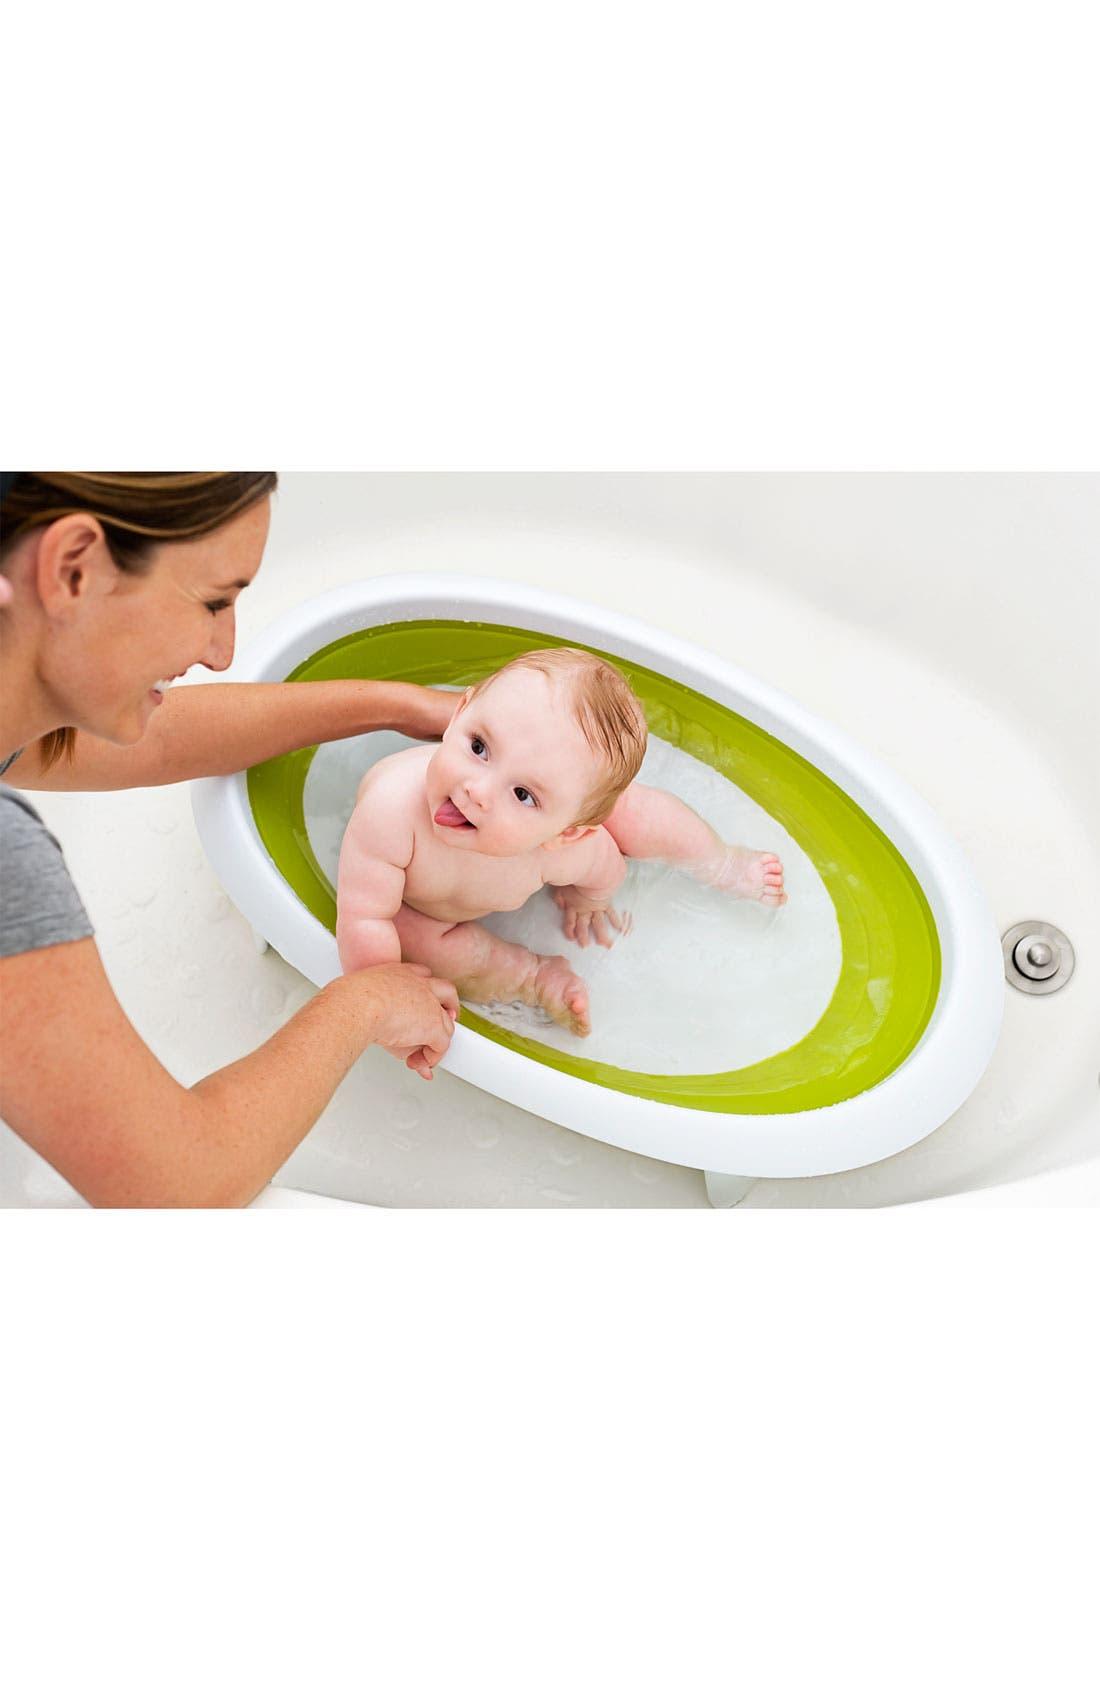 'Naked' Collapsible Bathtub,                             Alternate thumbnail 3, color,                             300